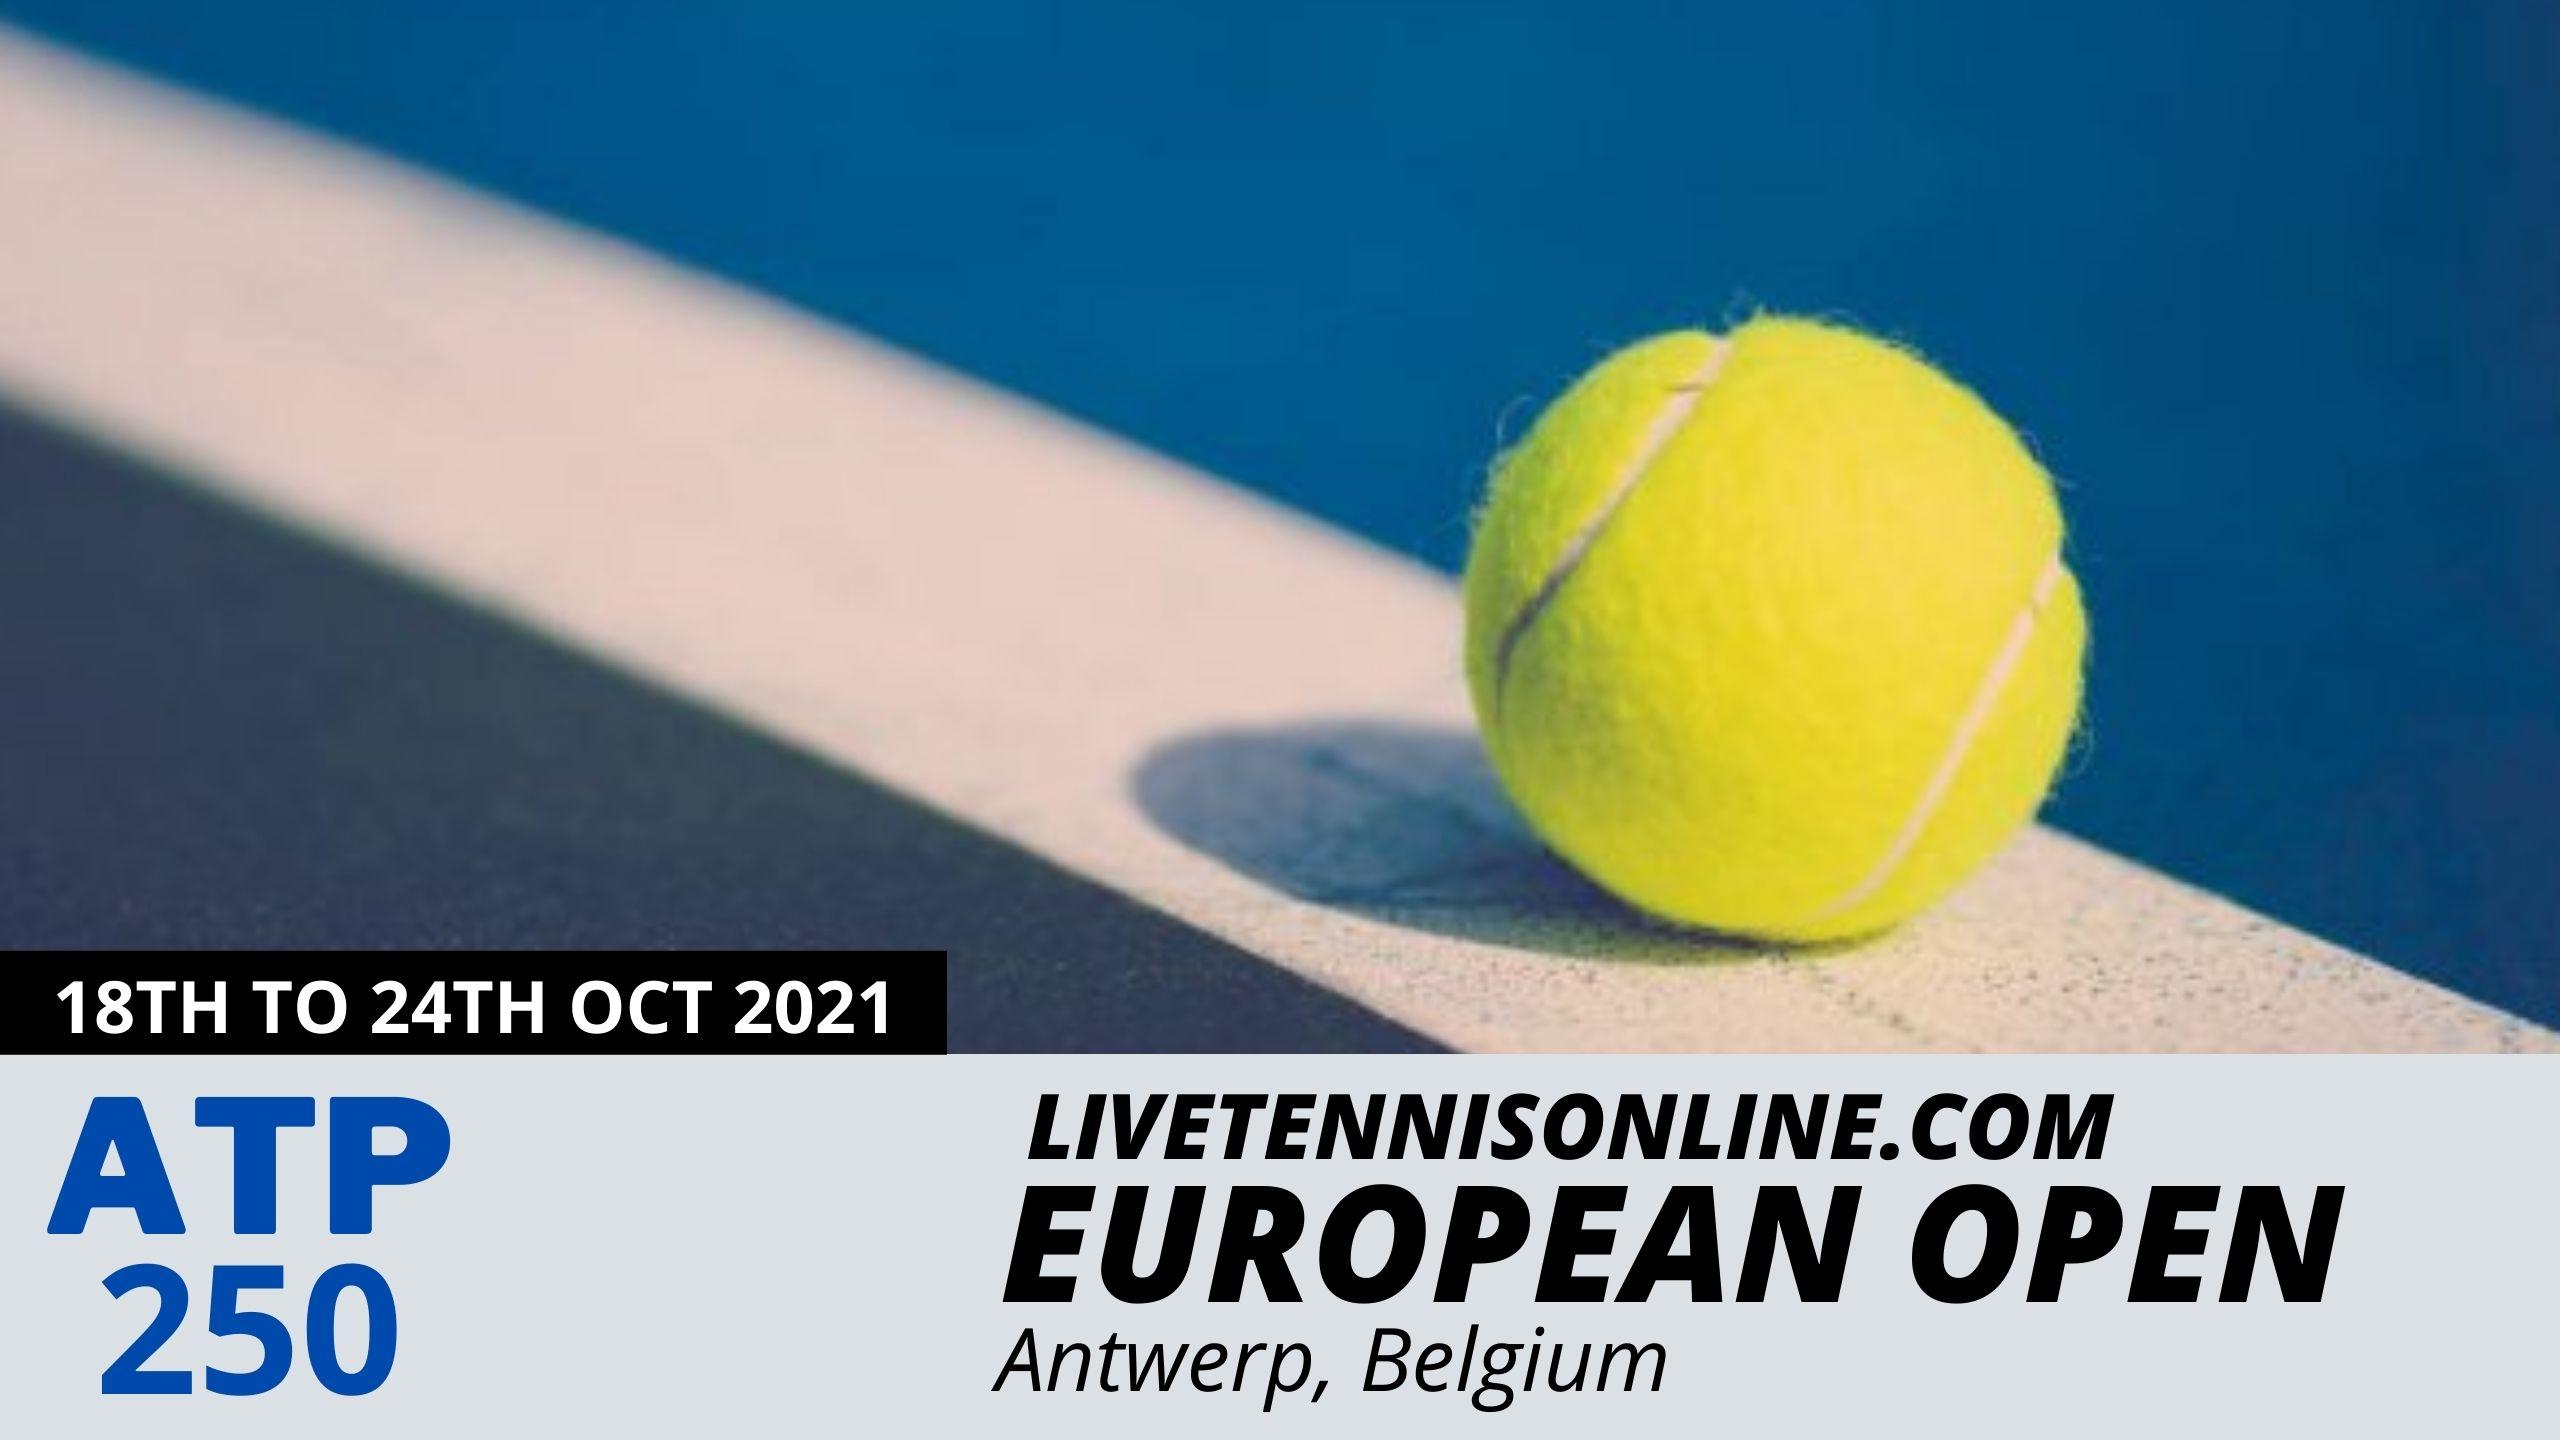 European Open Live Stream 2021 | ATP Final